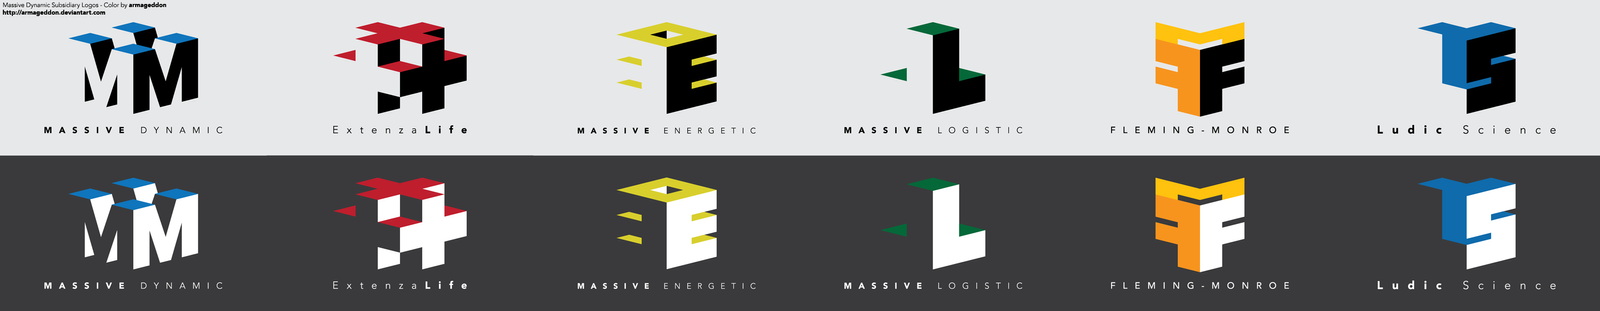 Design Element Abstract 008 in addition Liverpool Logo 262 moreover Royal besides Usq likewise Article cd hak mattersburg. on love logo design